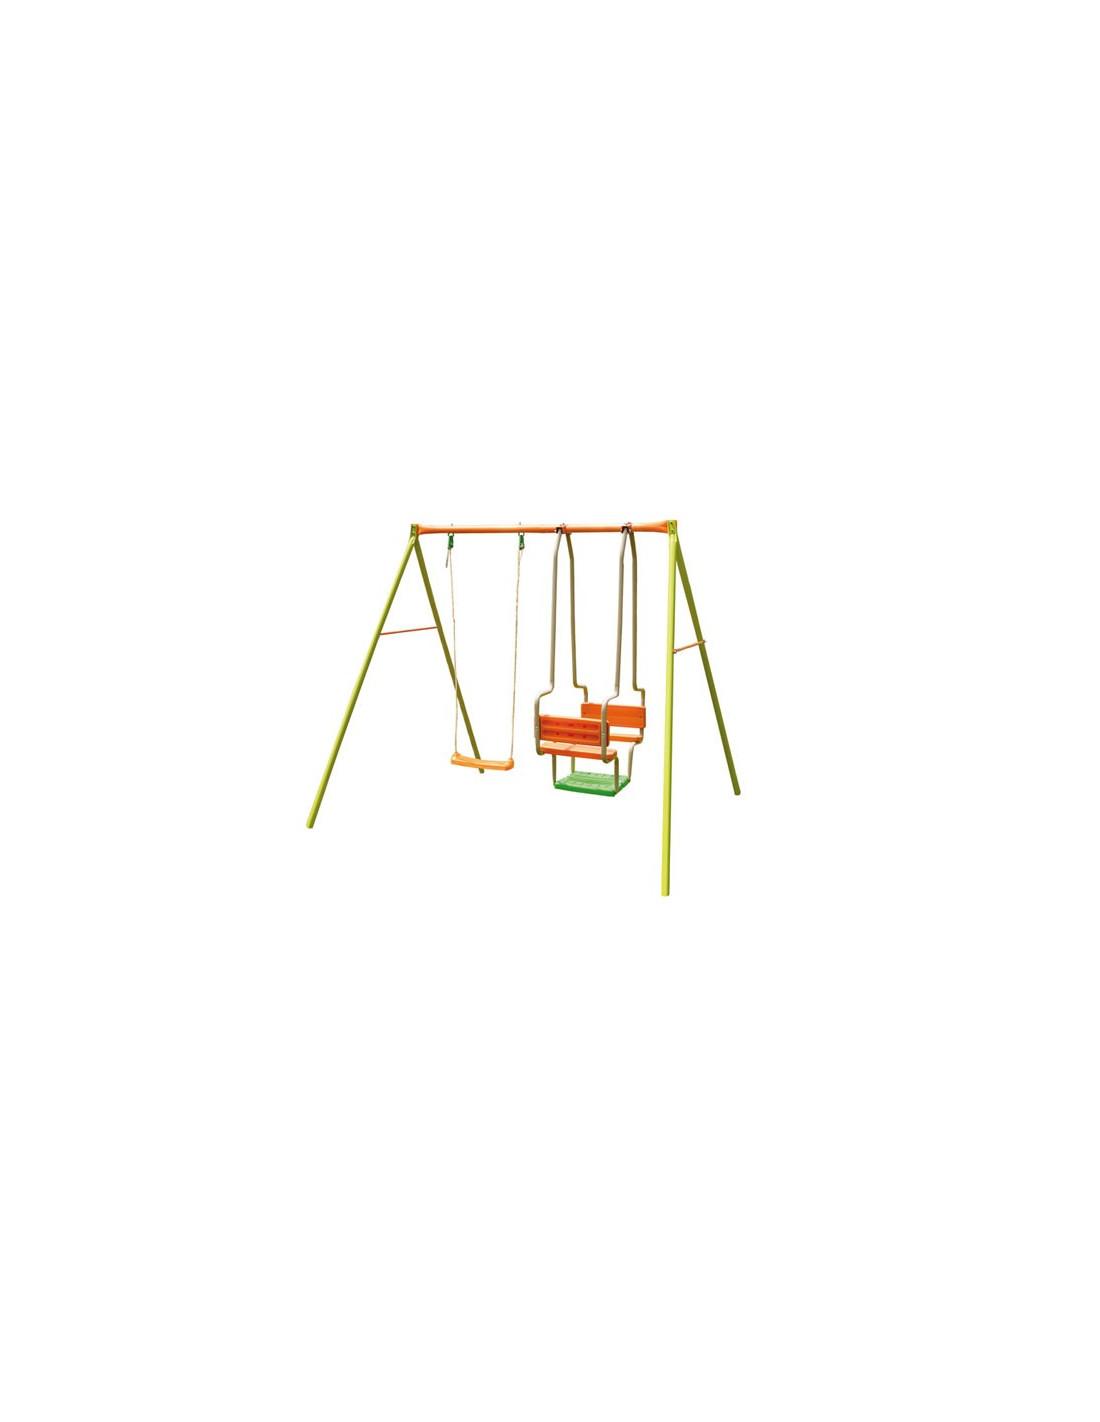 trigano amca portique 1 balan oire 1 balancelle hyper brico. Black Bedroom Furniture Sets. Home Design Ideas